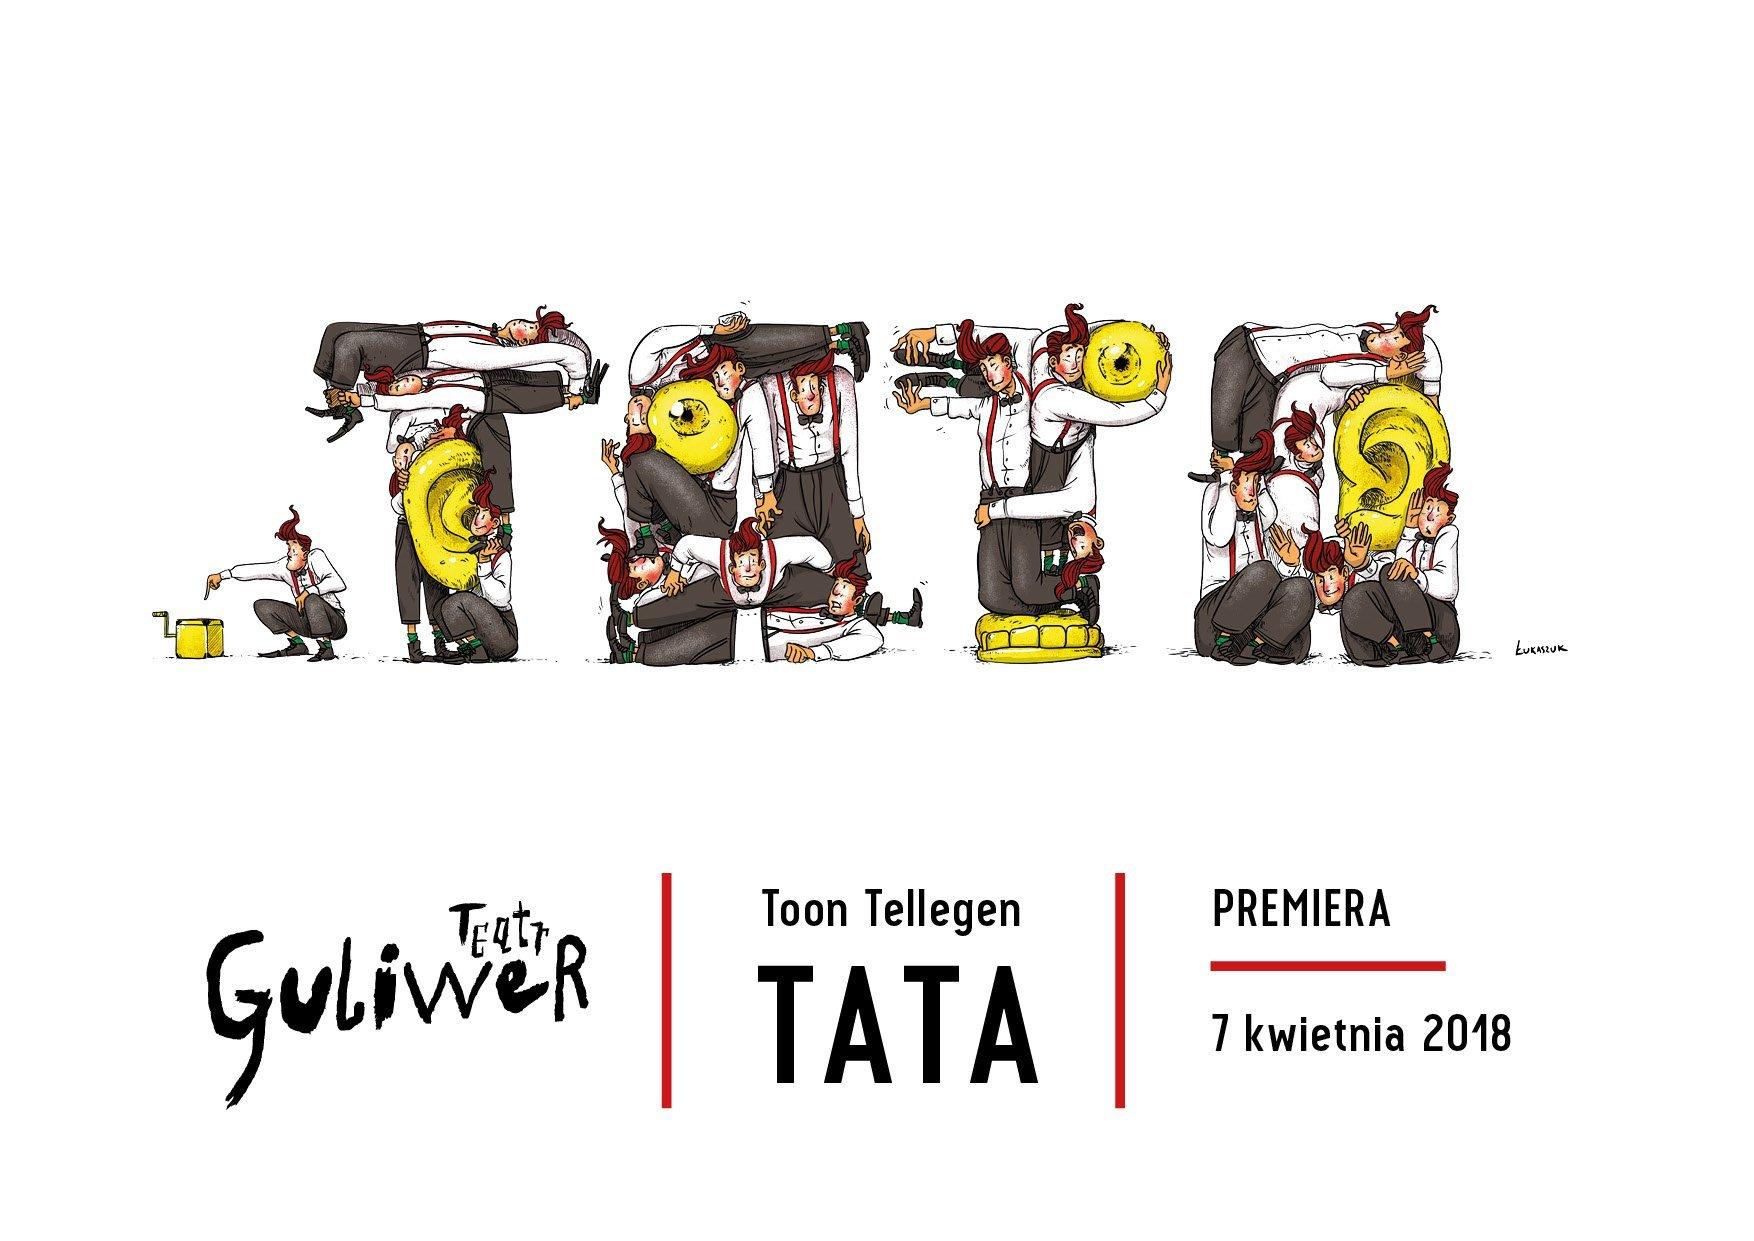 Tata - premiera w Teatrze Guliwer